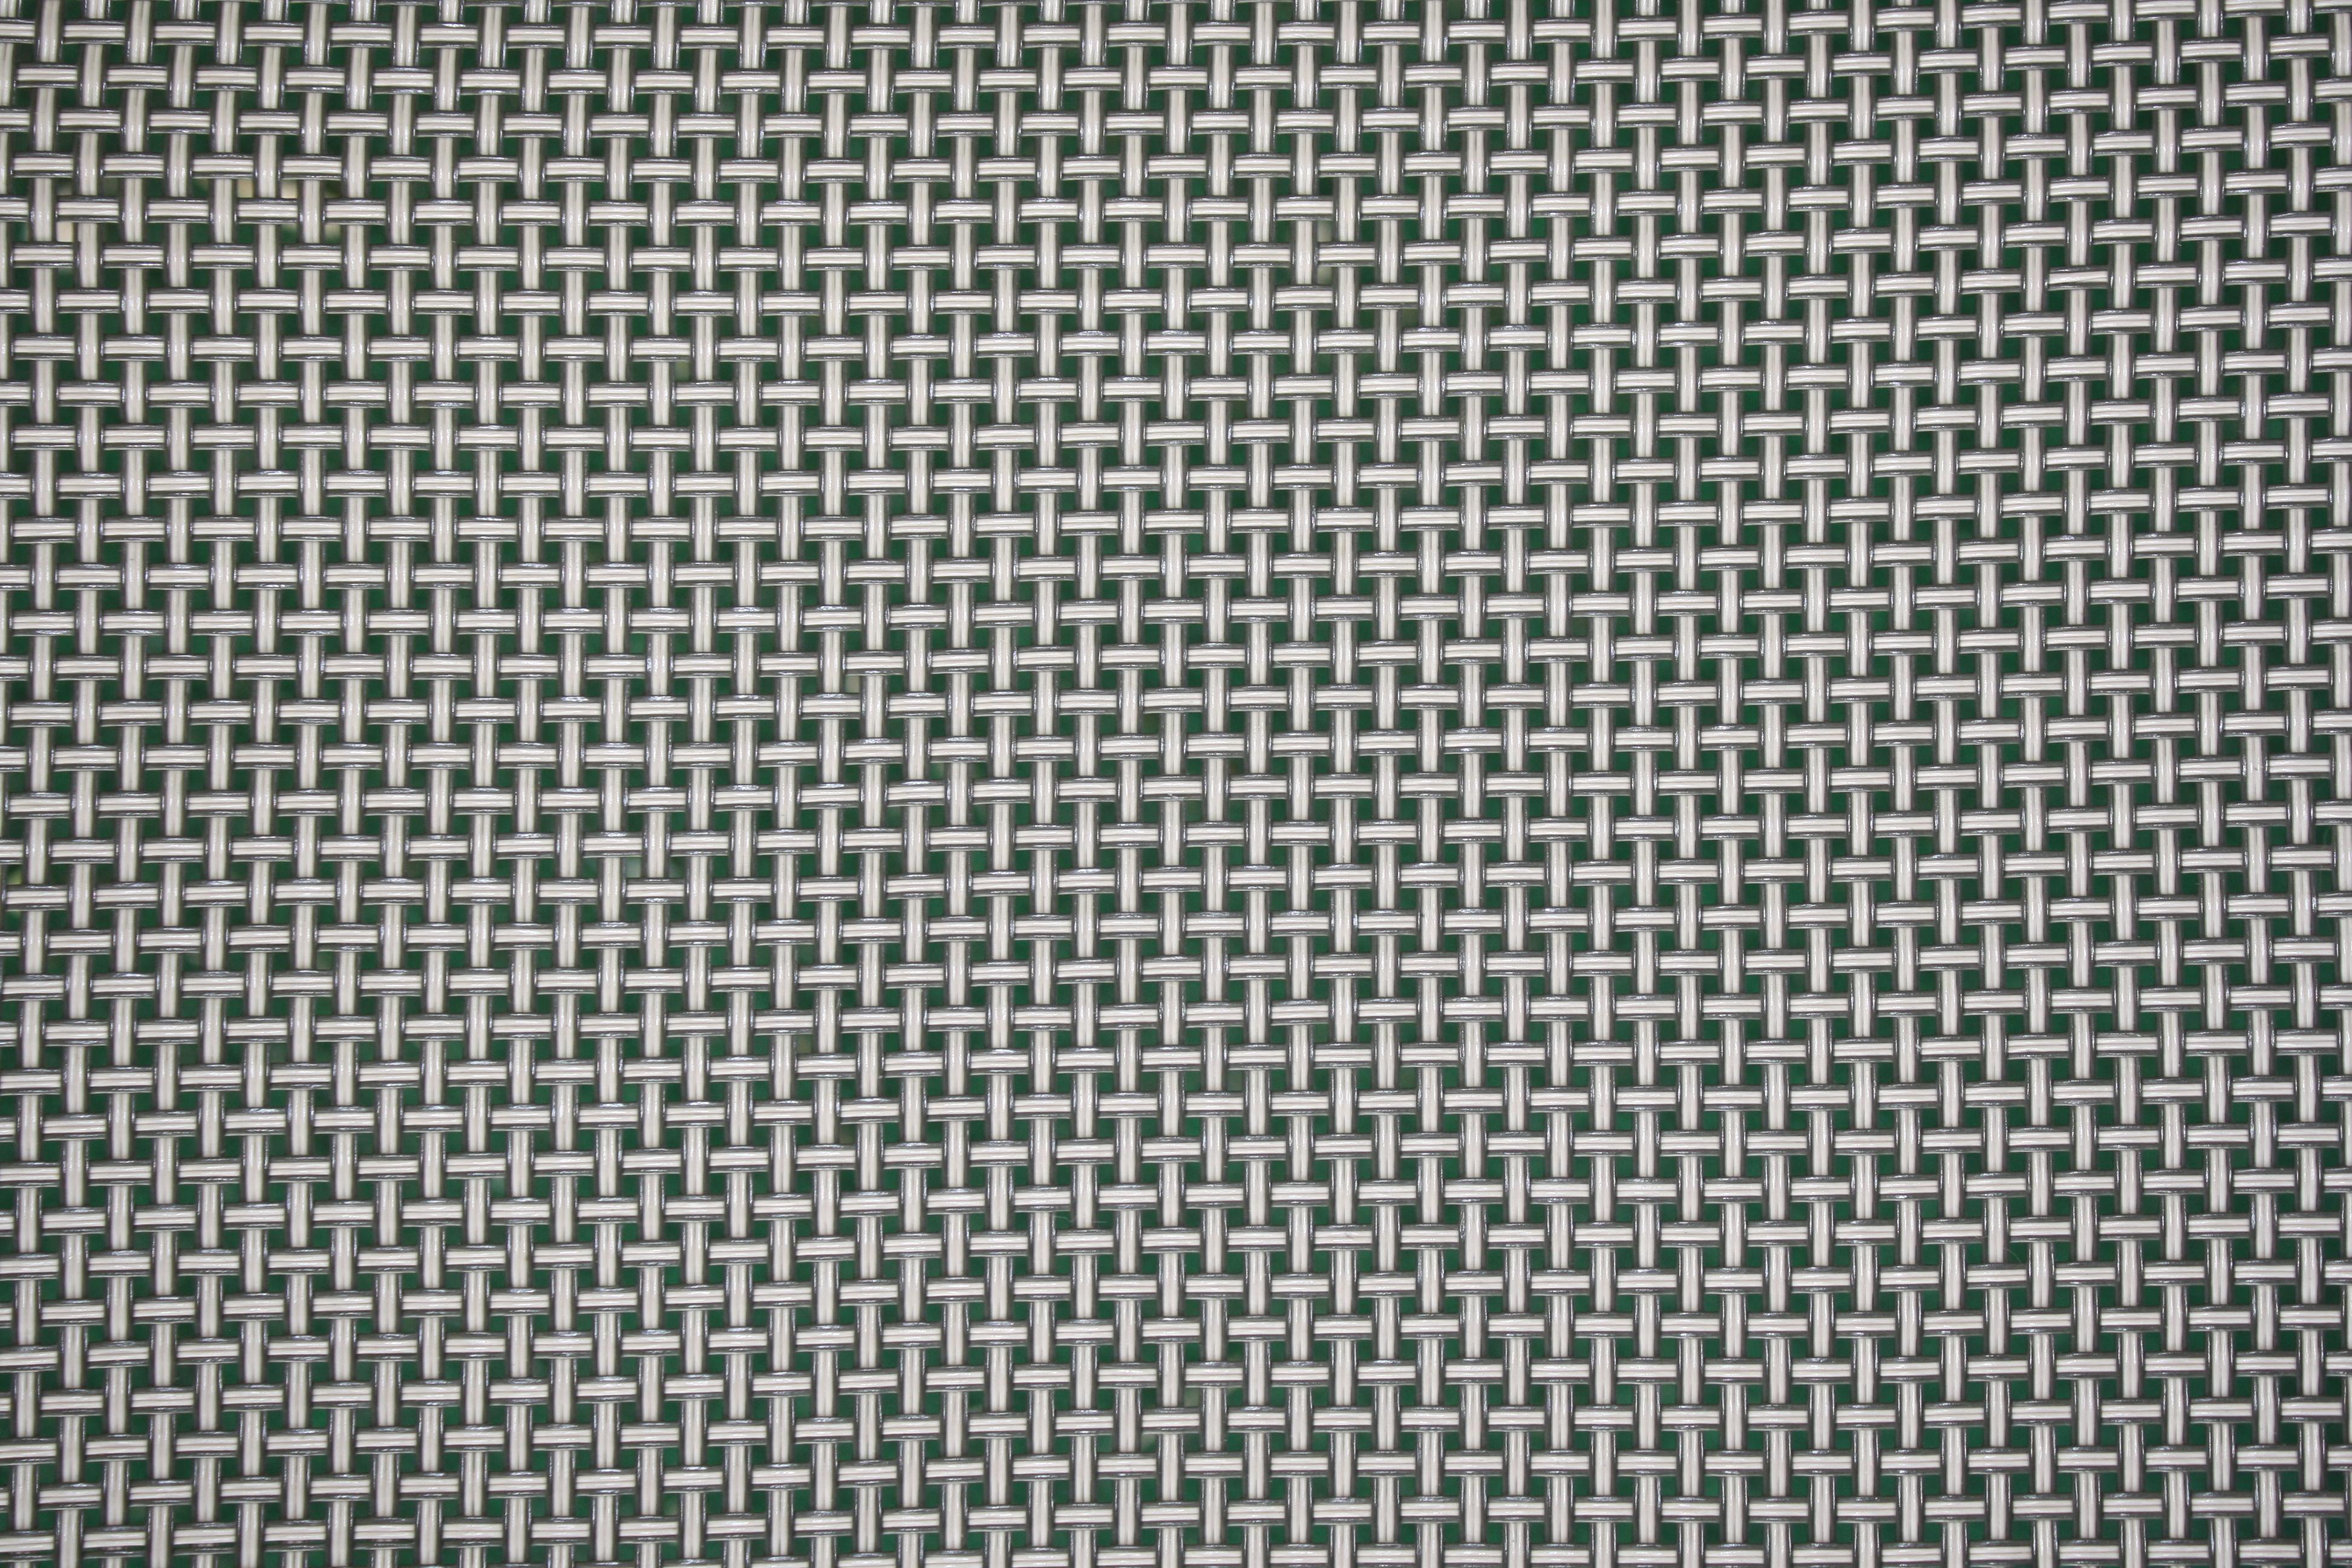 Woven Plastic Texture Picture Free Photograph Photos